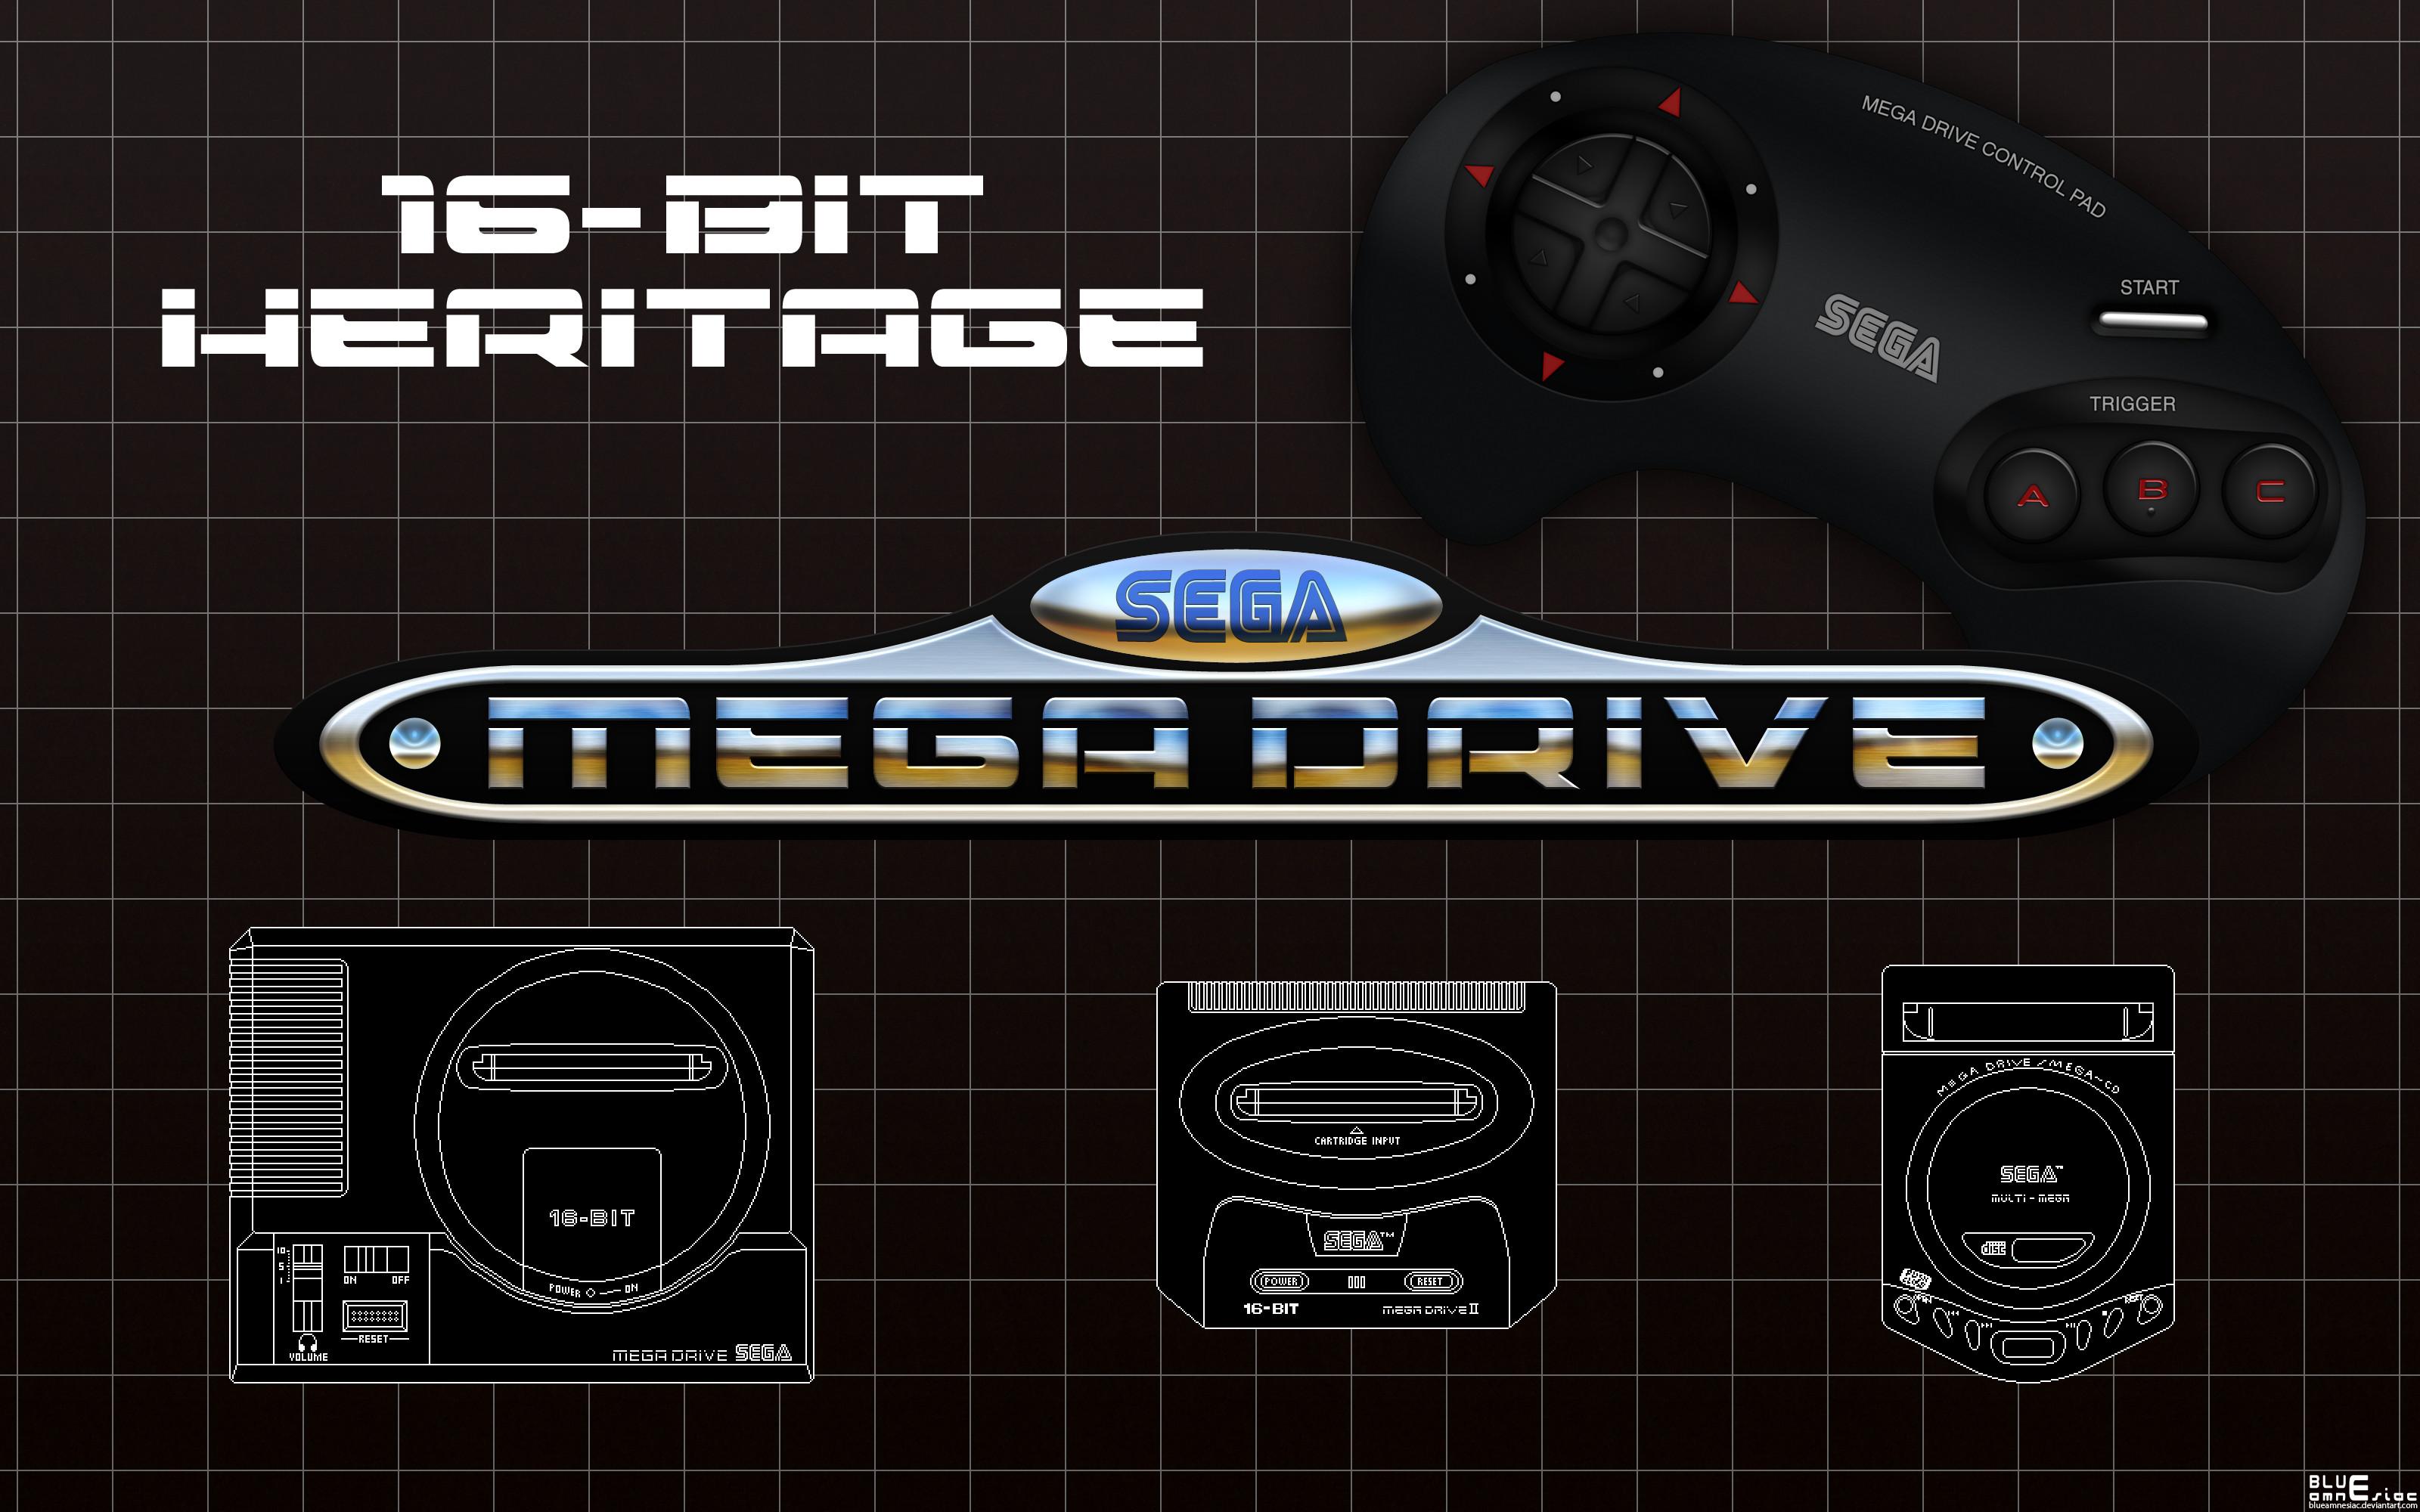 … Sega Mega Drive: 16-bit Heritage Wallpaper by BLUEamnesiac